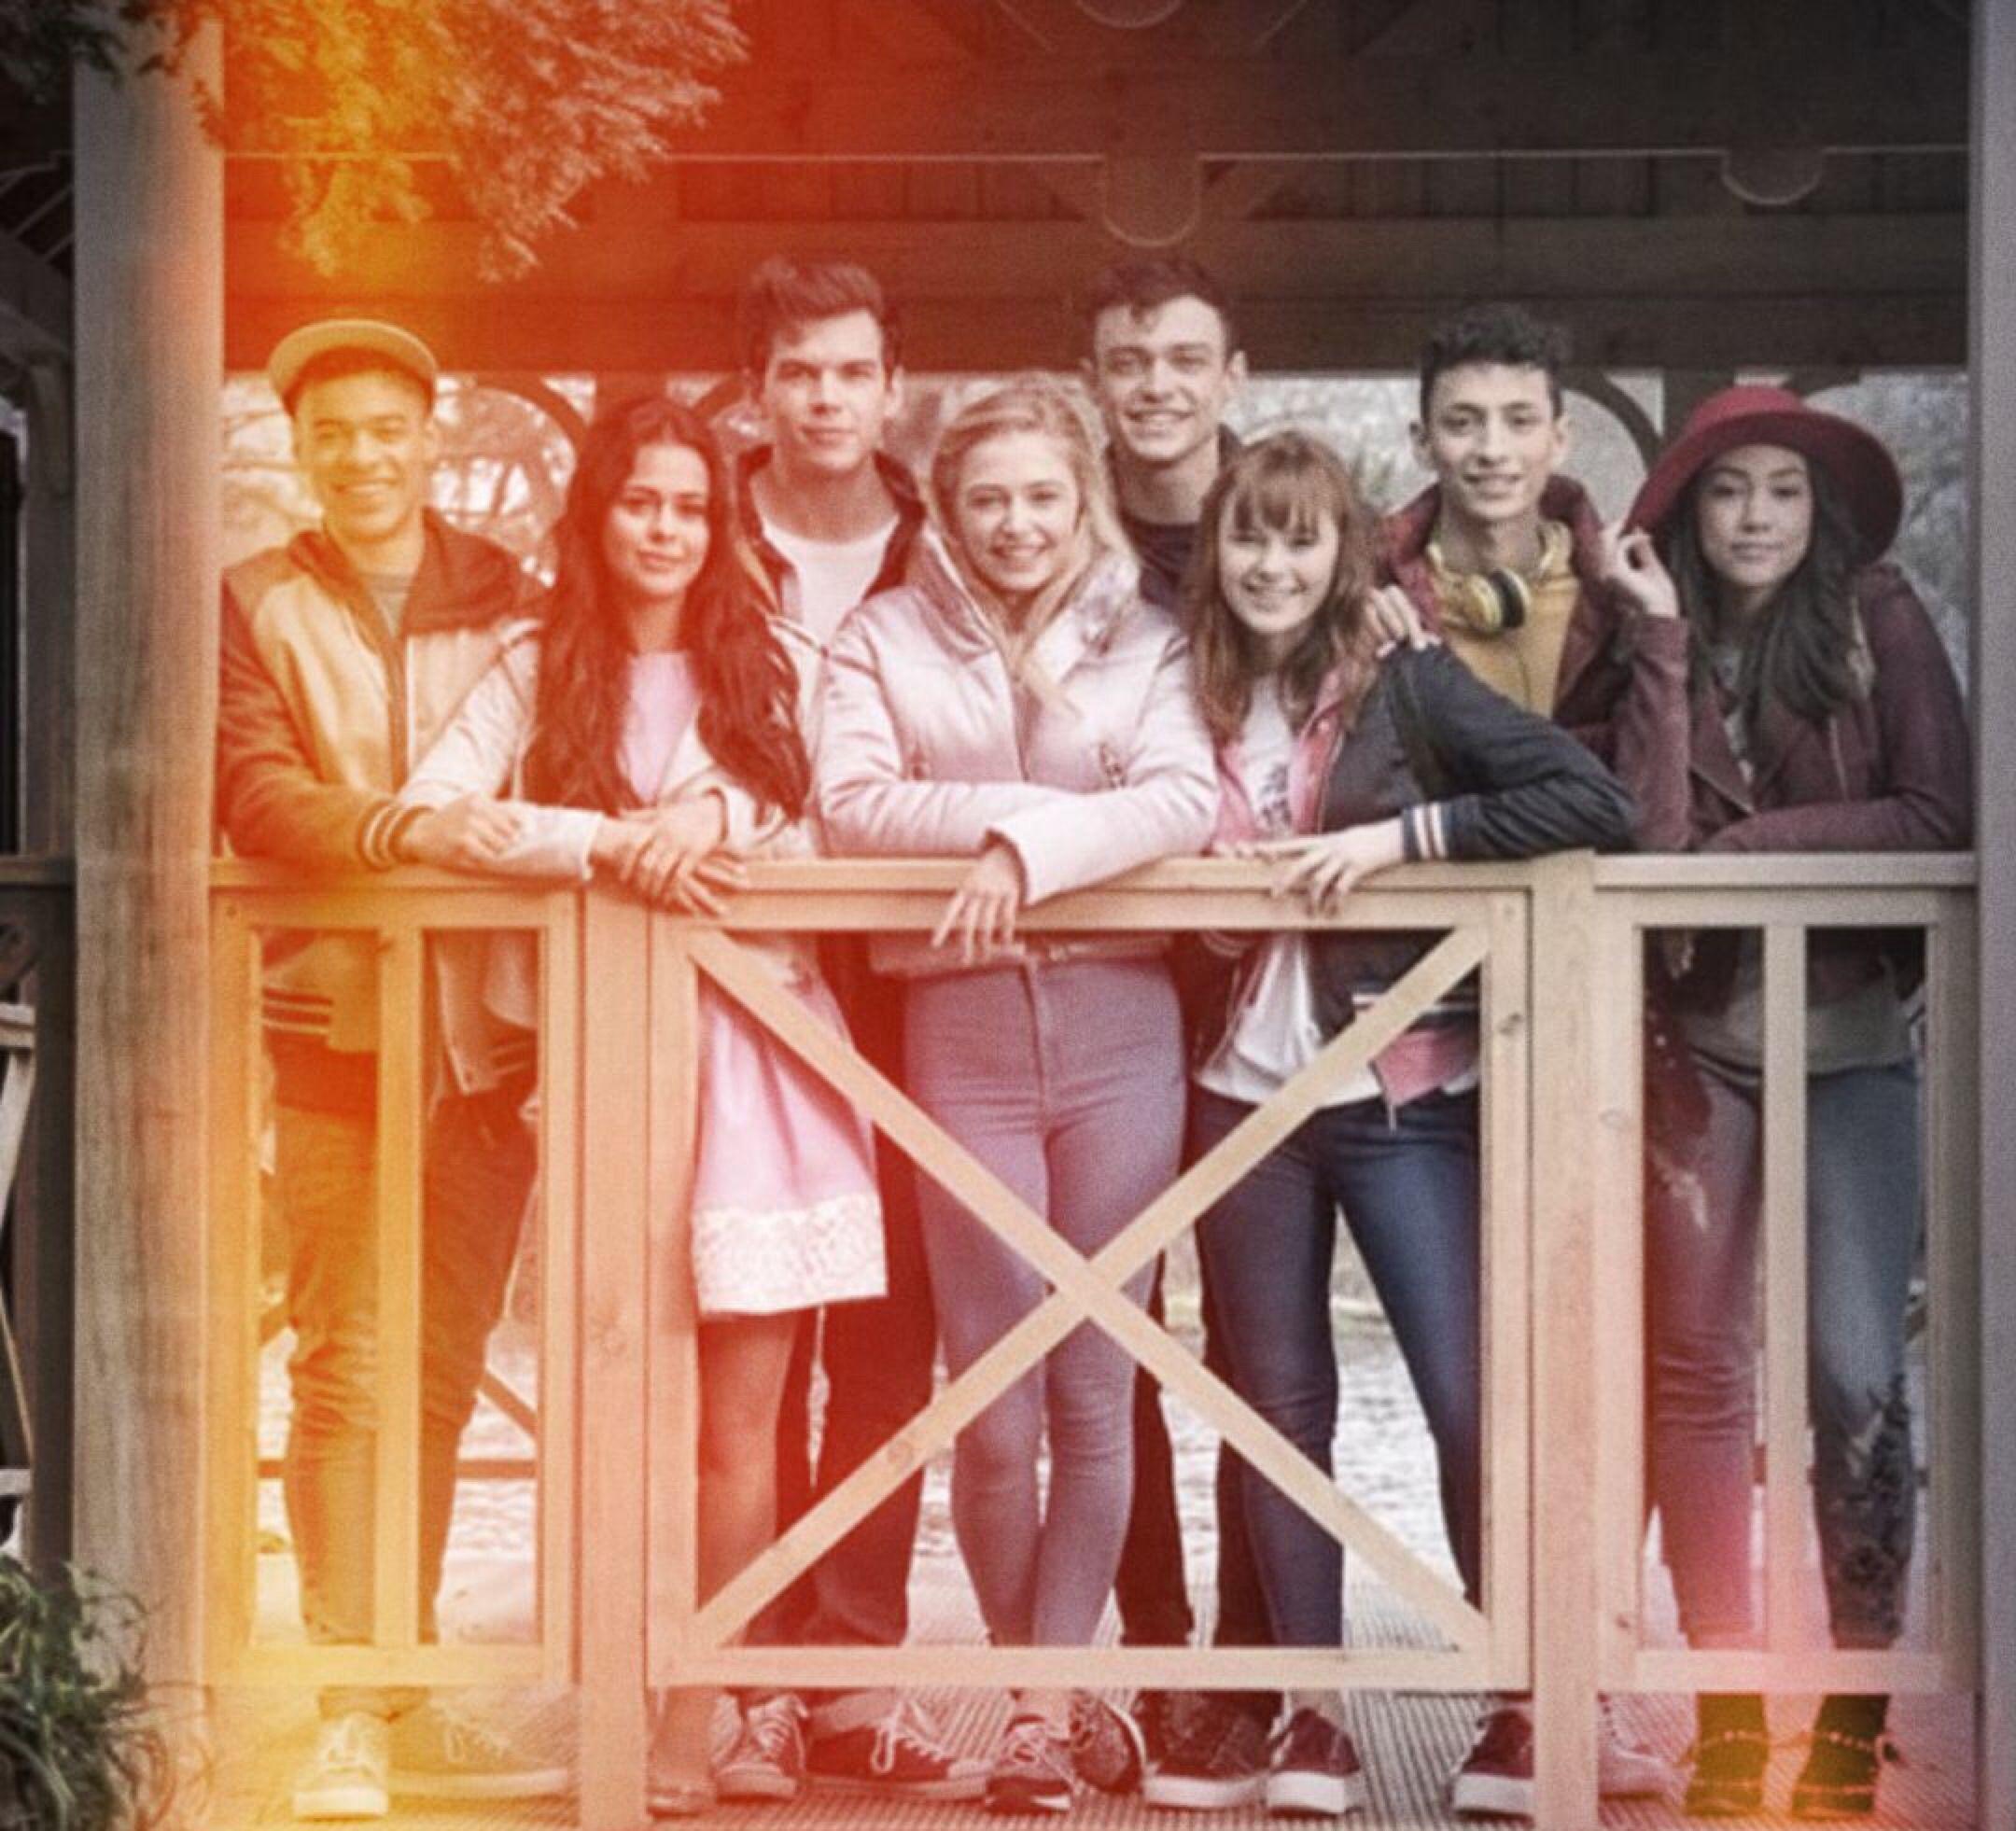 The Lodge Disney Channel Cast The lodge disney, Frozen